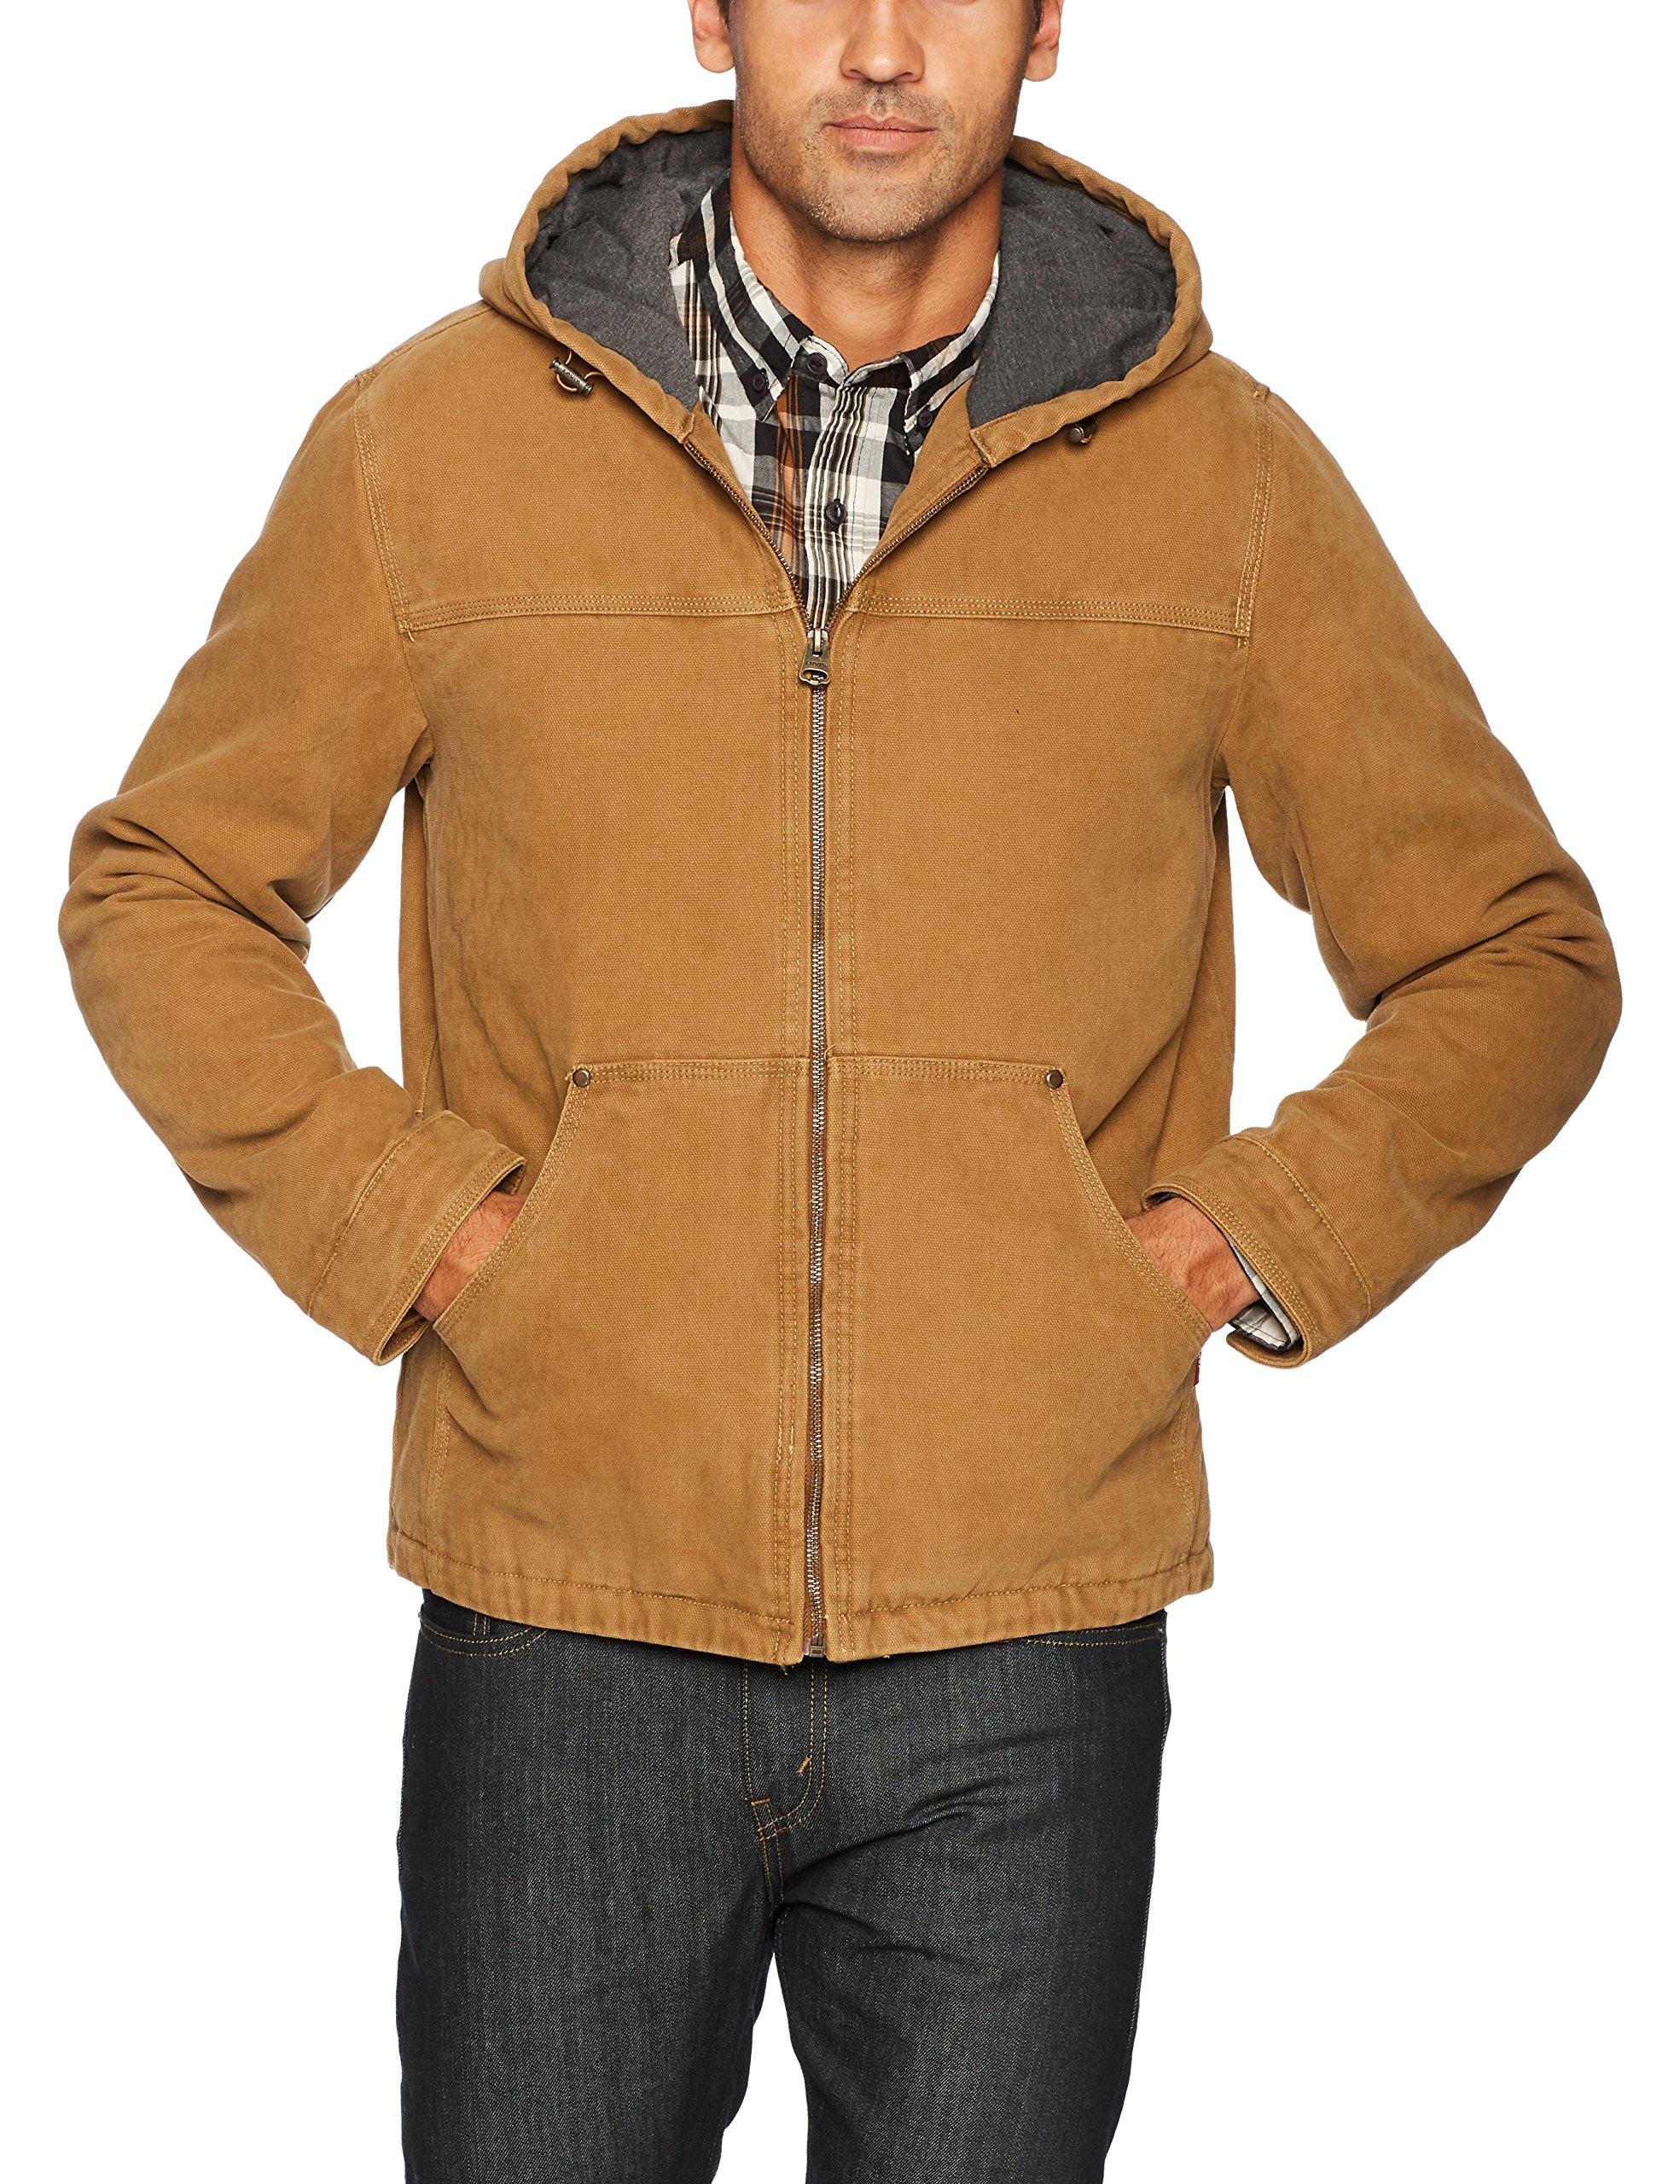 Levi's Men's Cotton Canvas Fleece Lined Hoody Jacket, Workers Brown, XX-Large